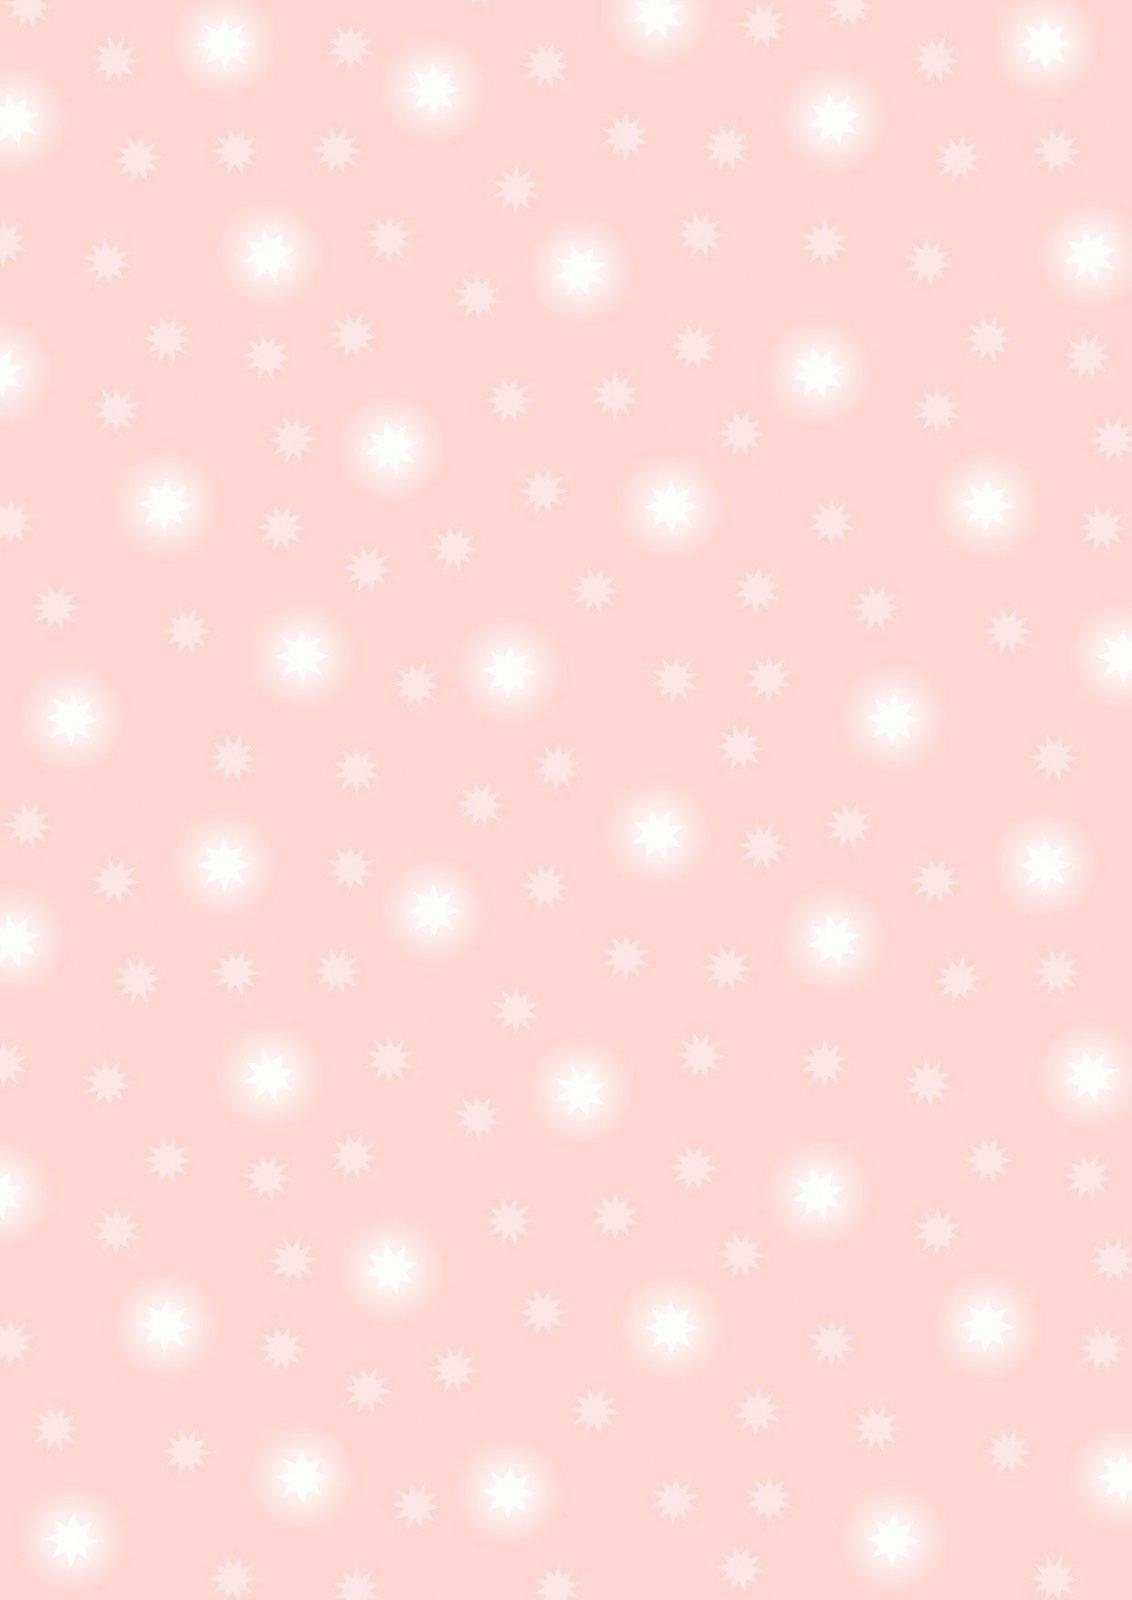 Pale Pink Starry Sky